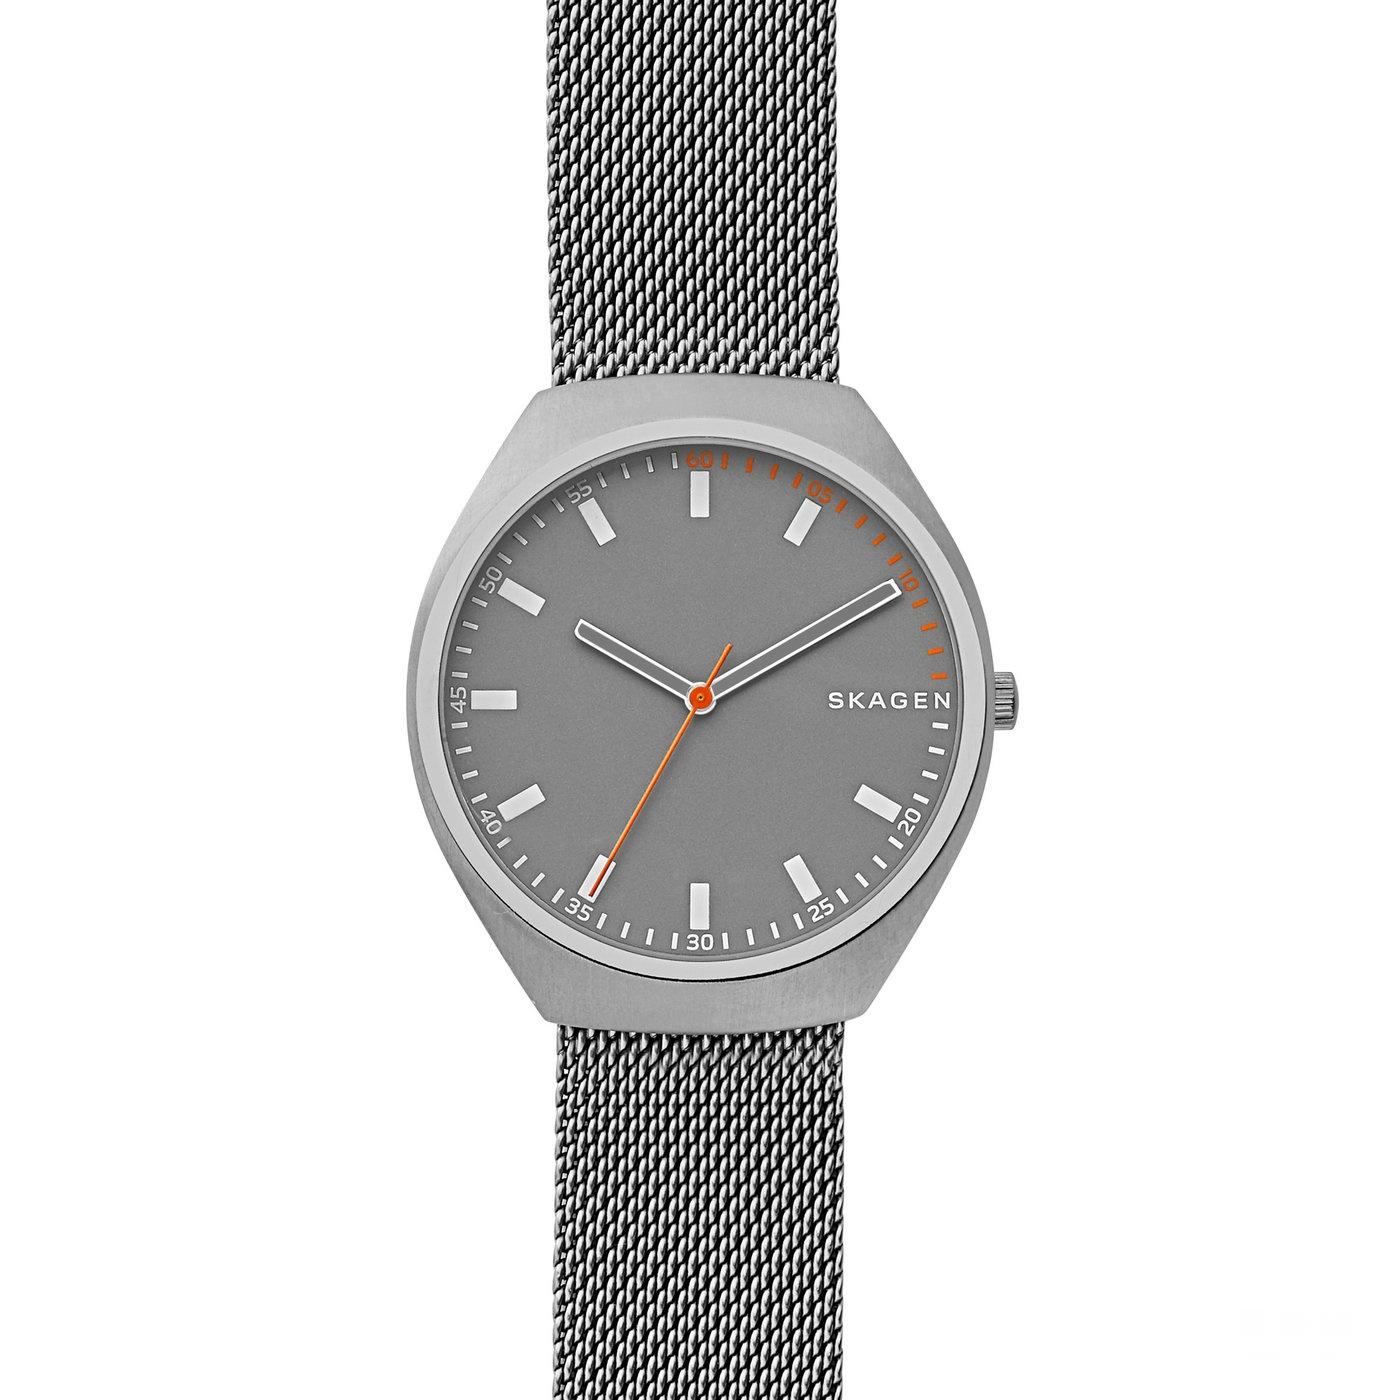 Fossil ——用腕表打造新学期百变时髦风格新主张